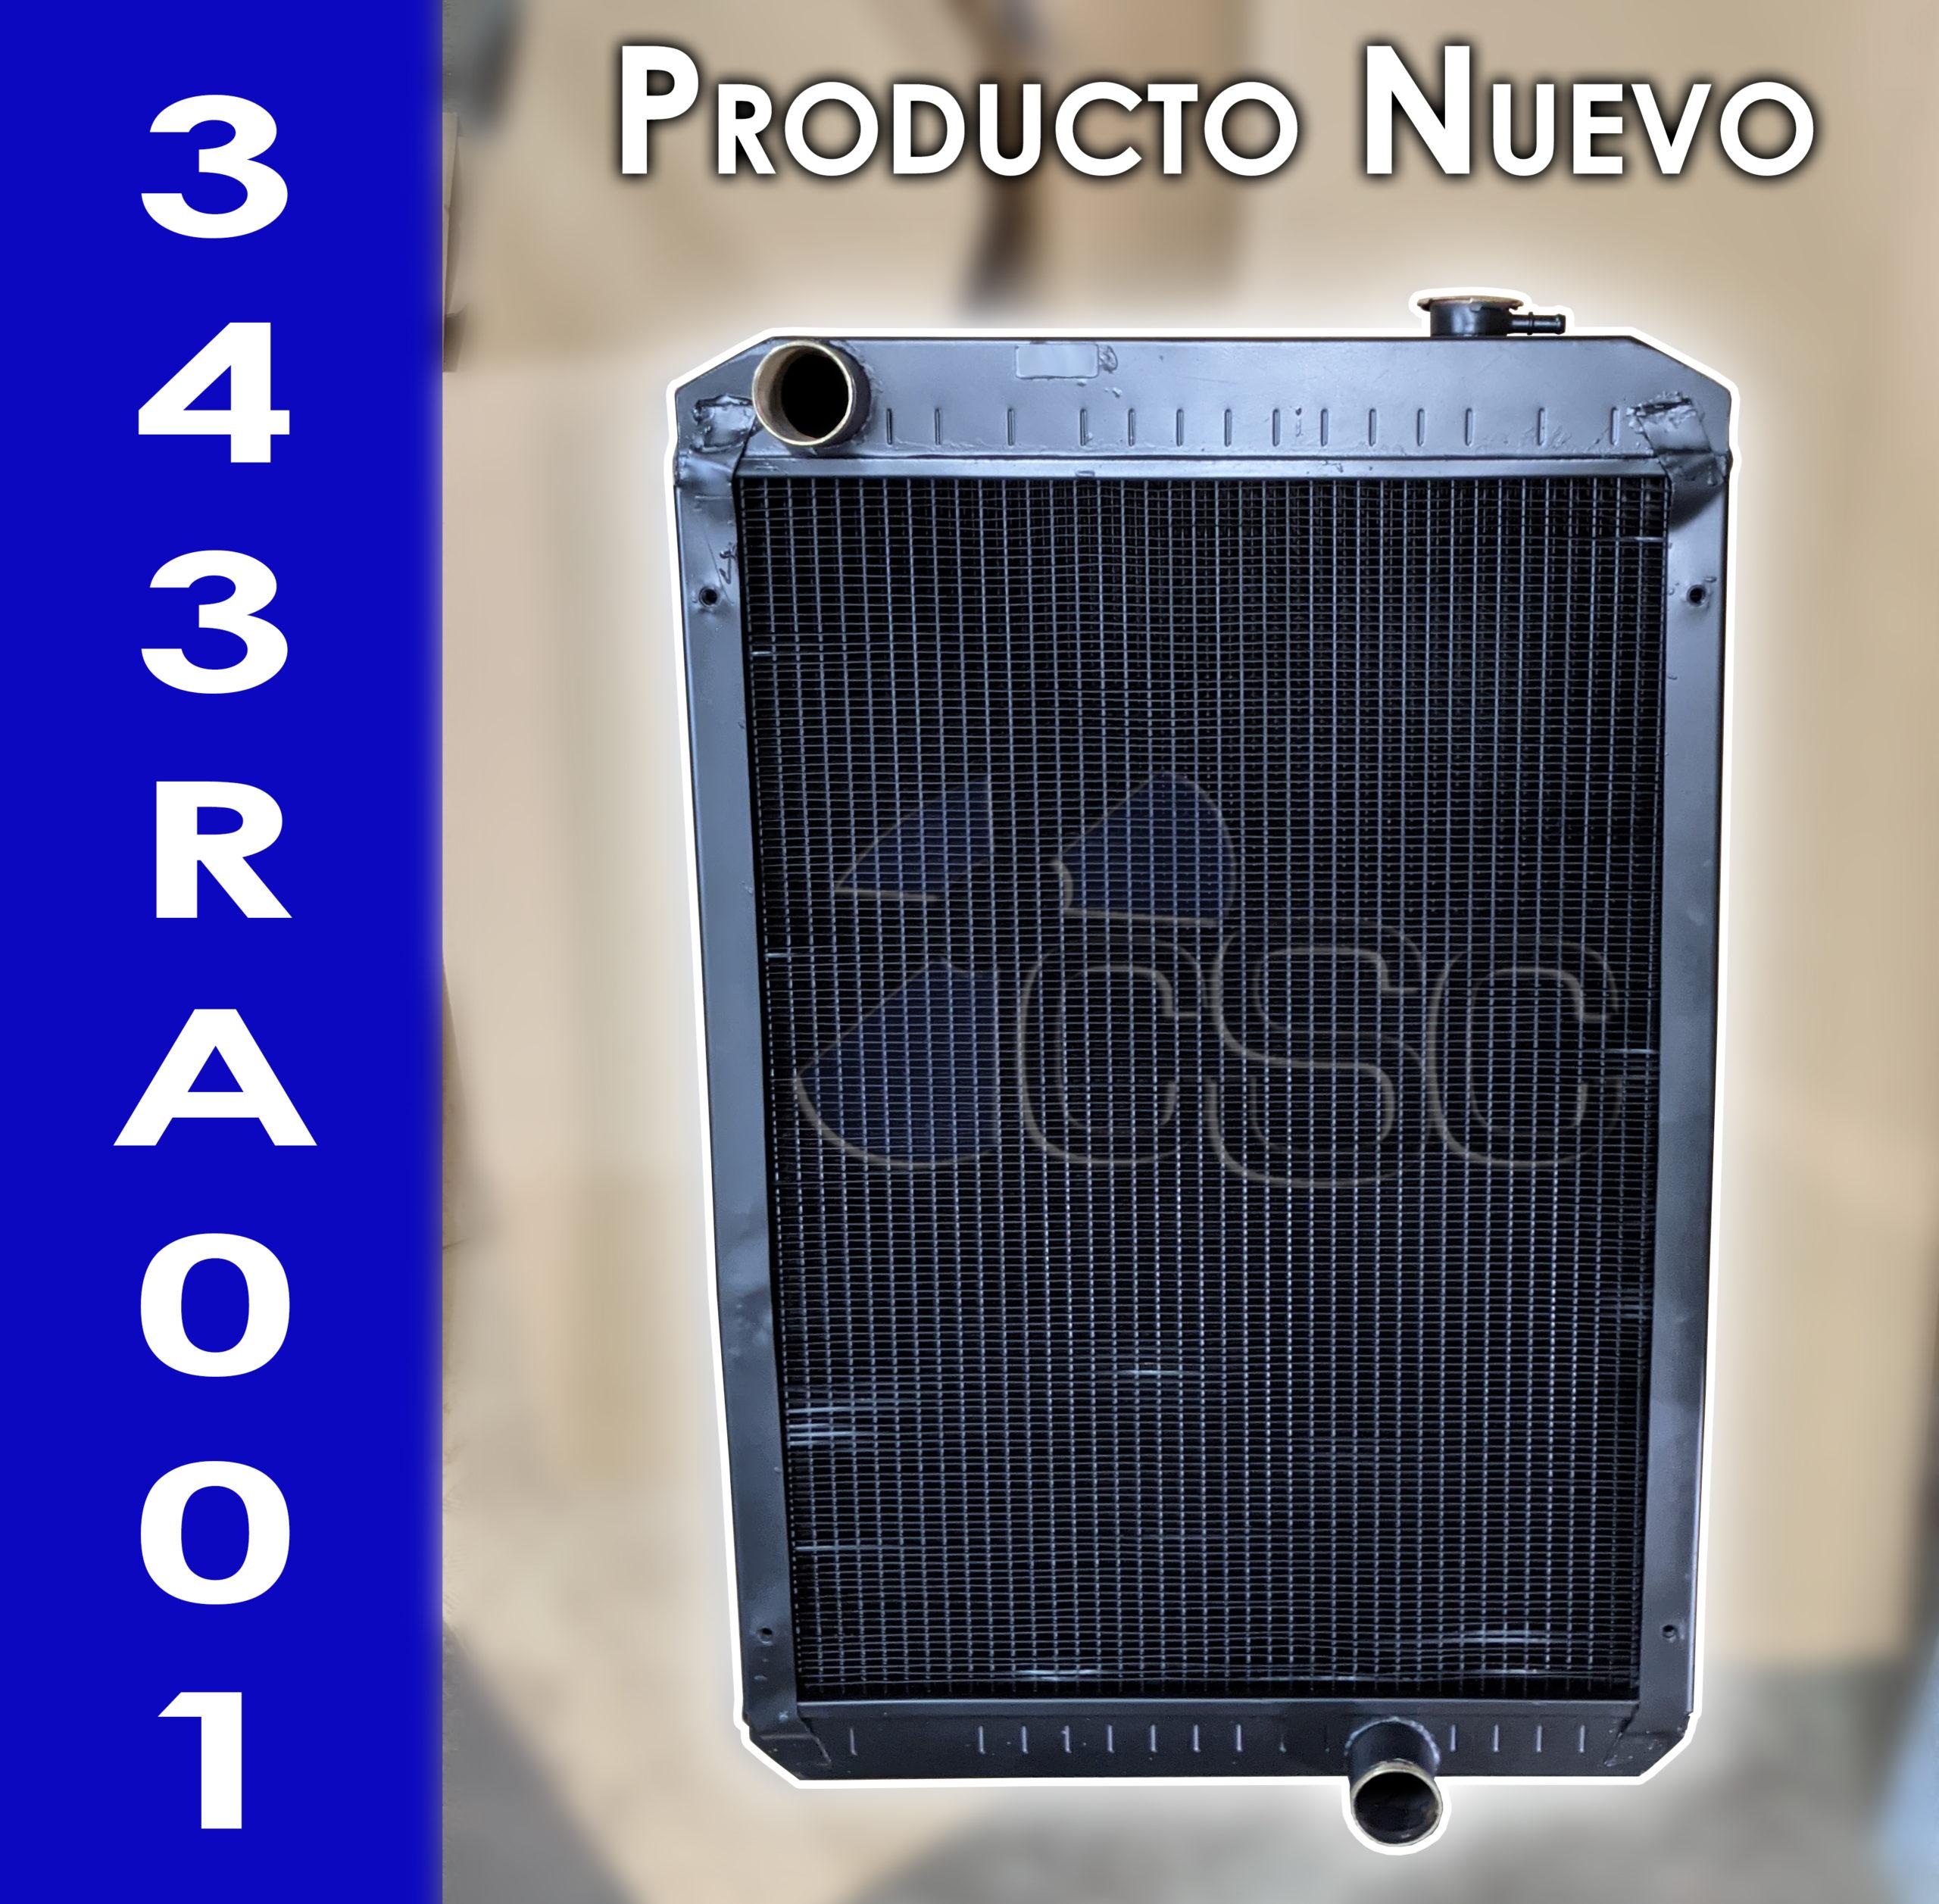 Nuevo radiador 343RA001 para Retroexcavadora John Deere 310G